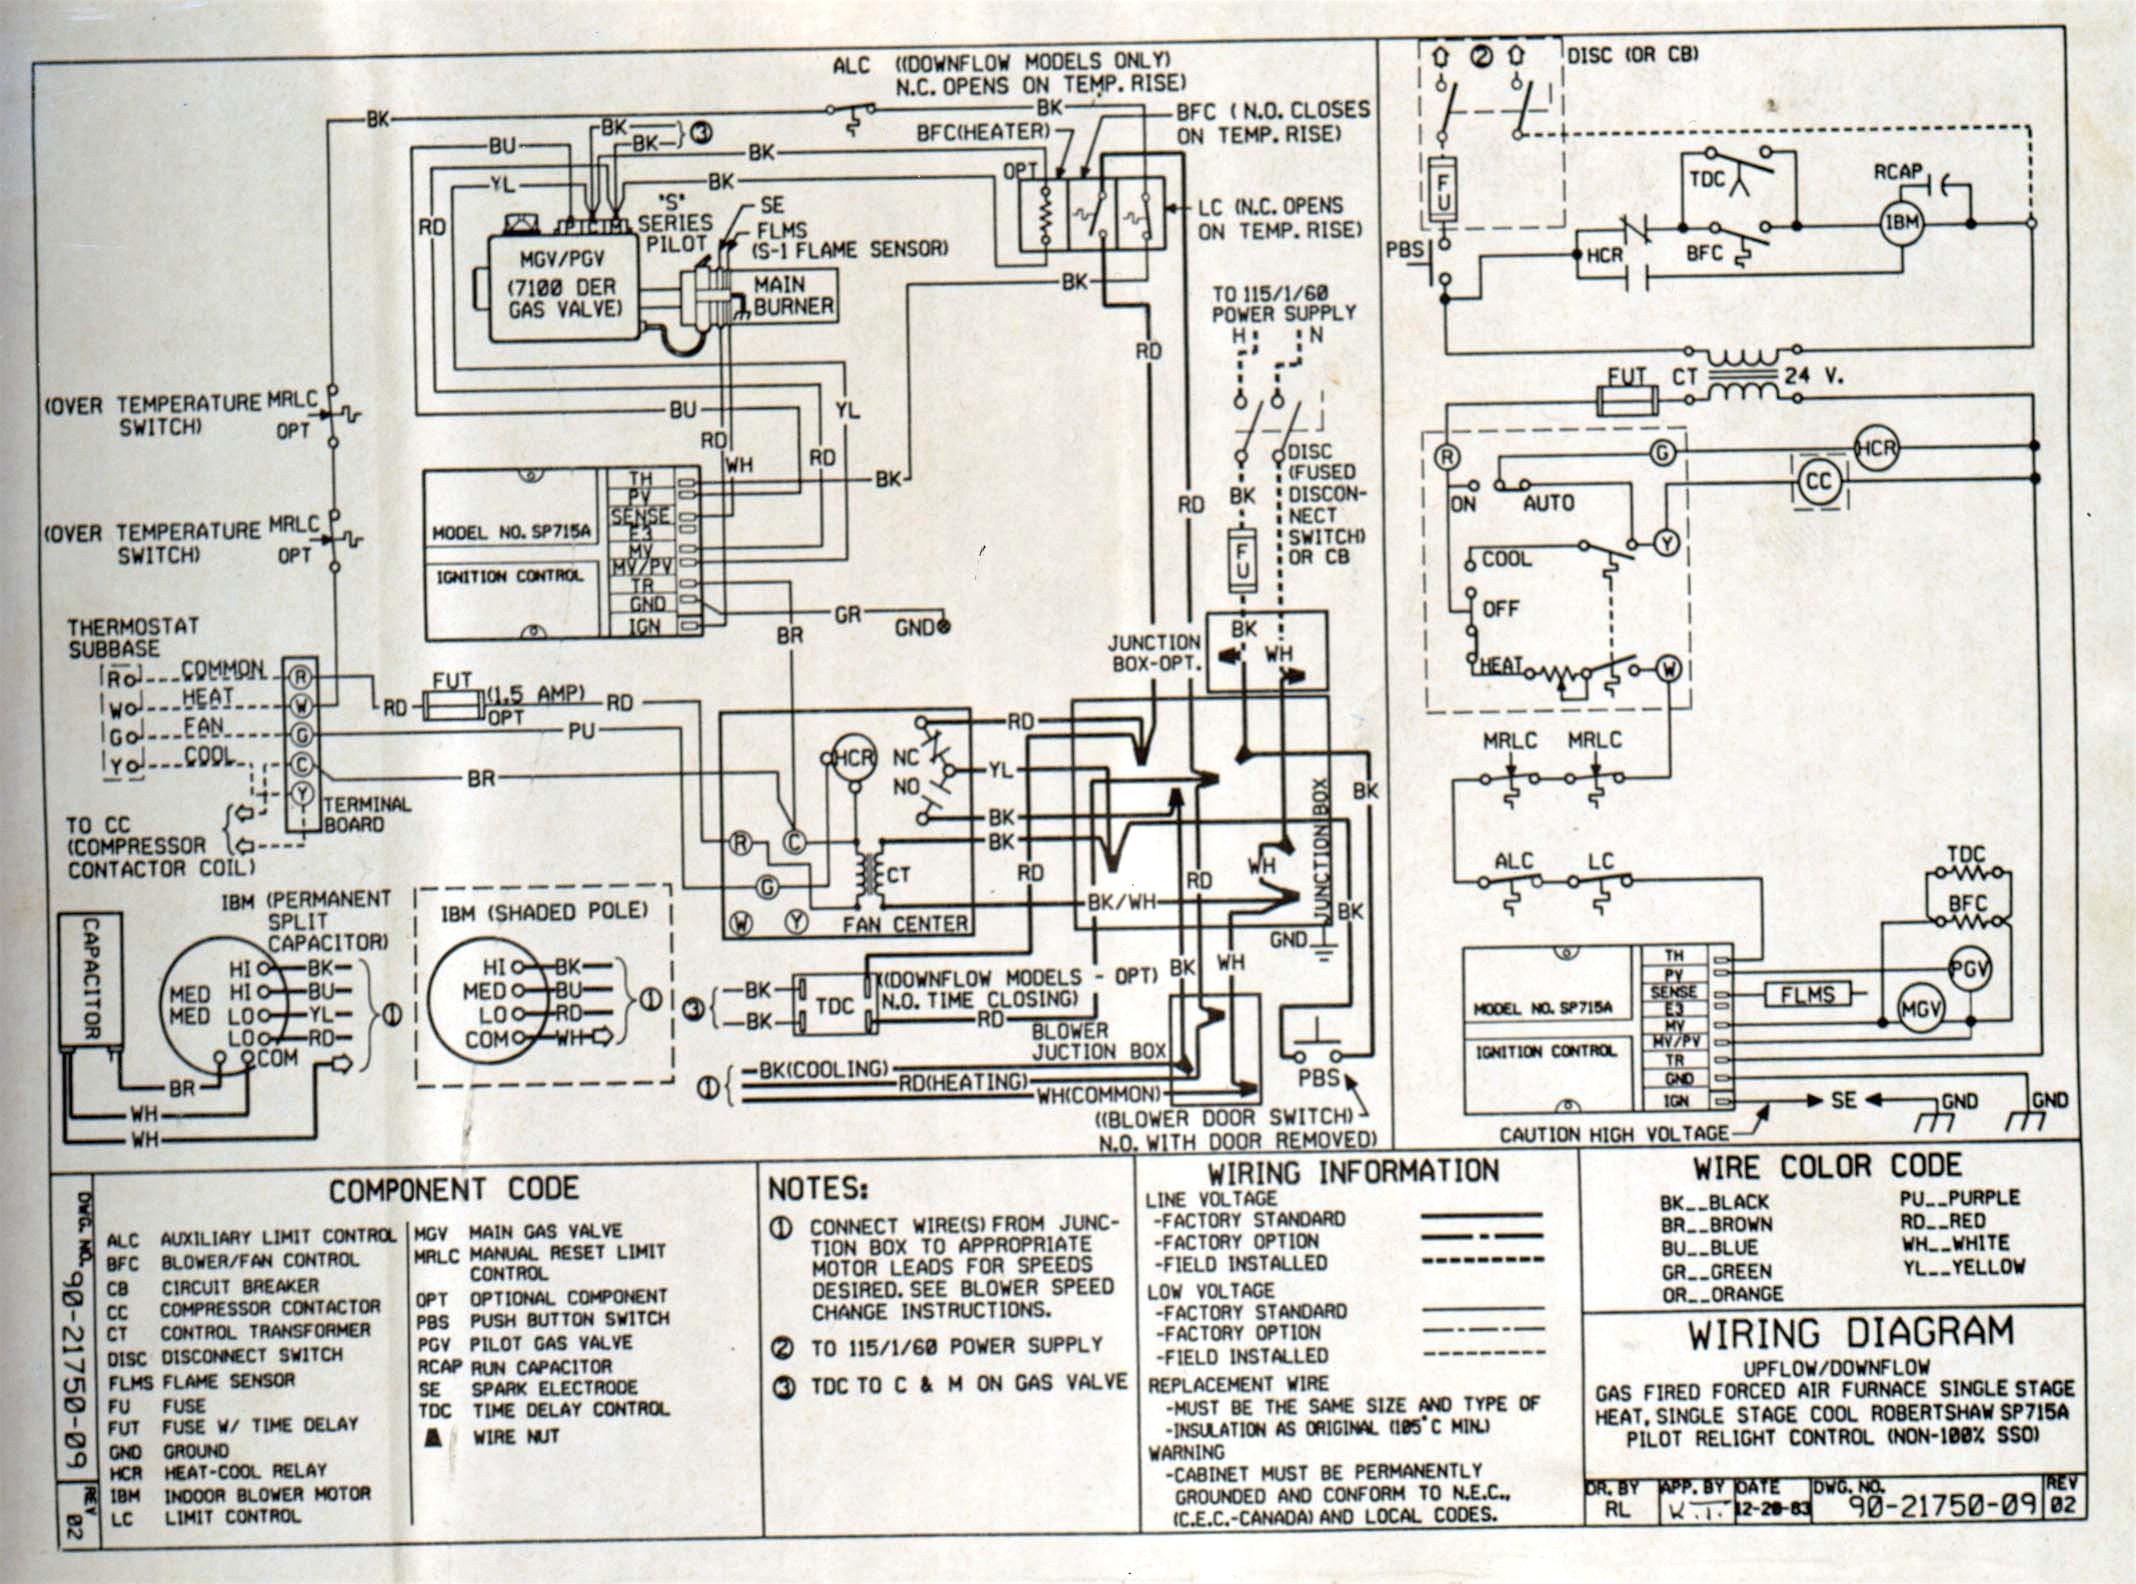 Braeburn Thermostat Wiring Heat Pump Diagram